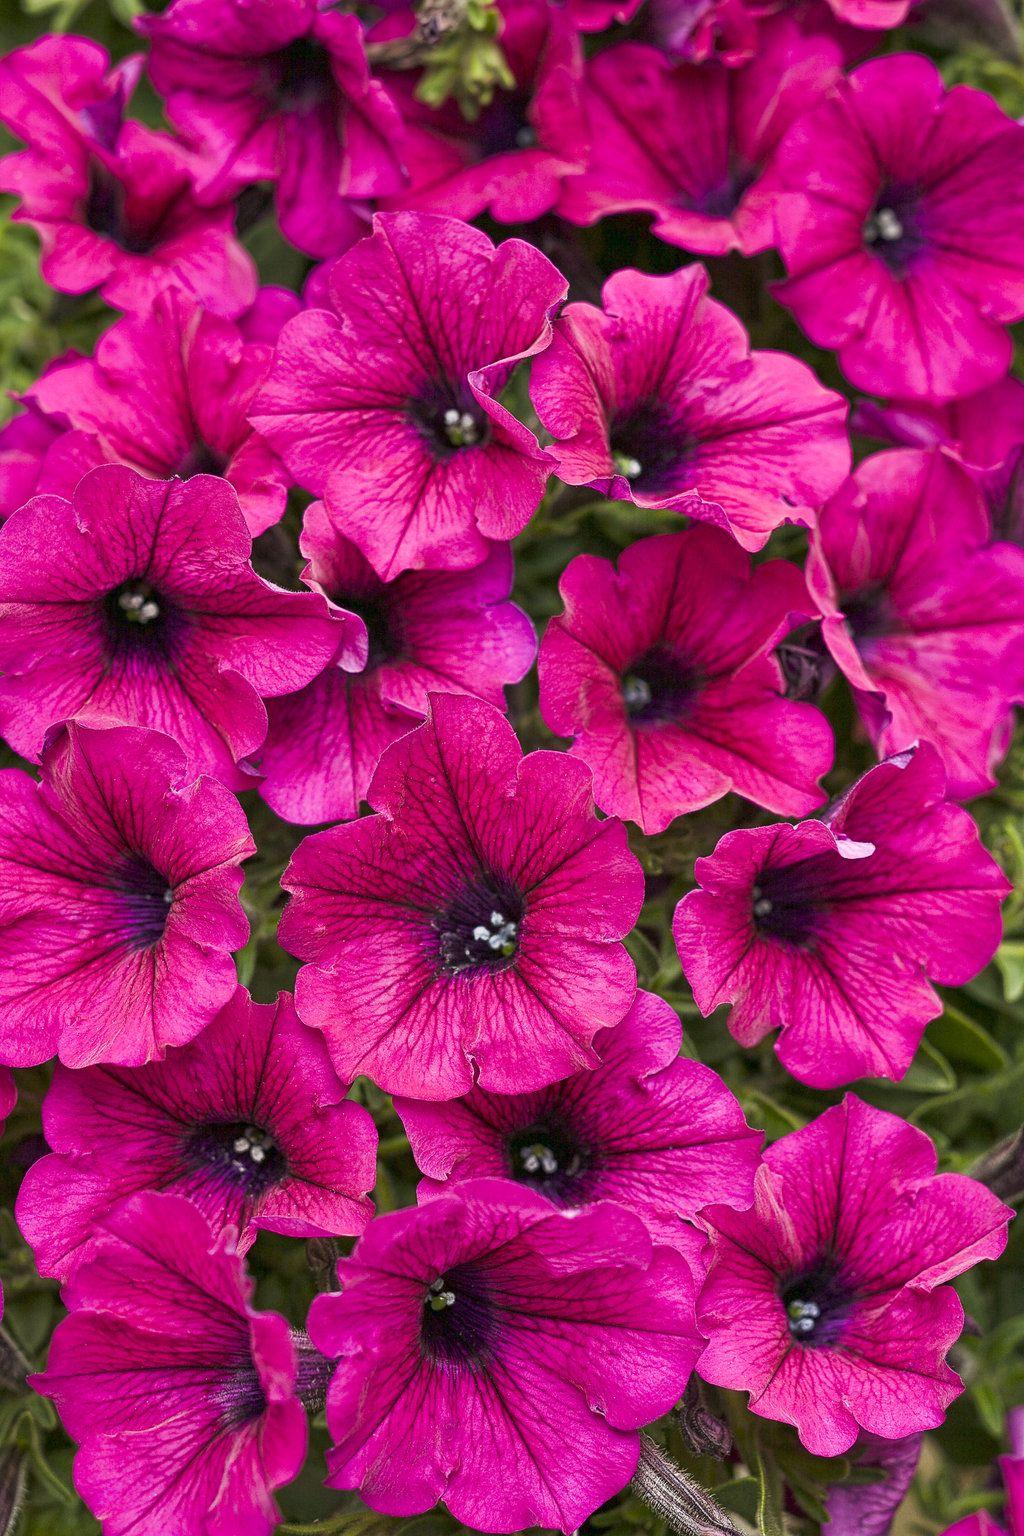 Supertunia Mini Purple Petunia Hybrid Purple Petunias Petunia Flower Petunia Plant